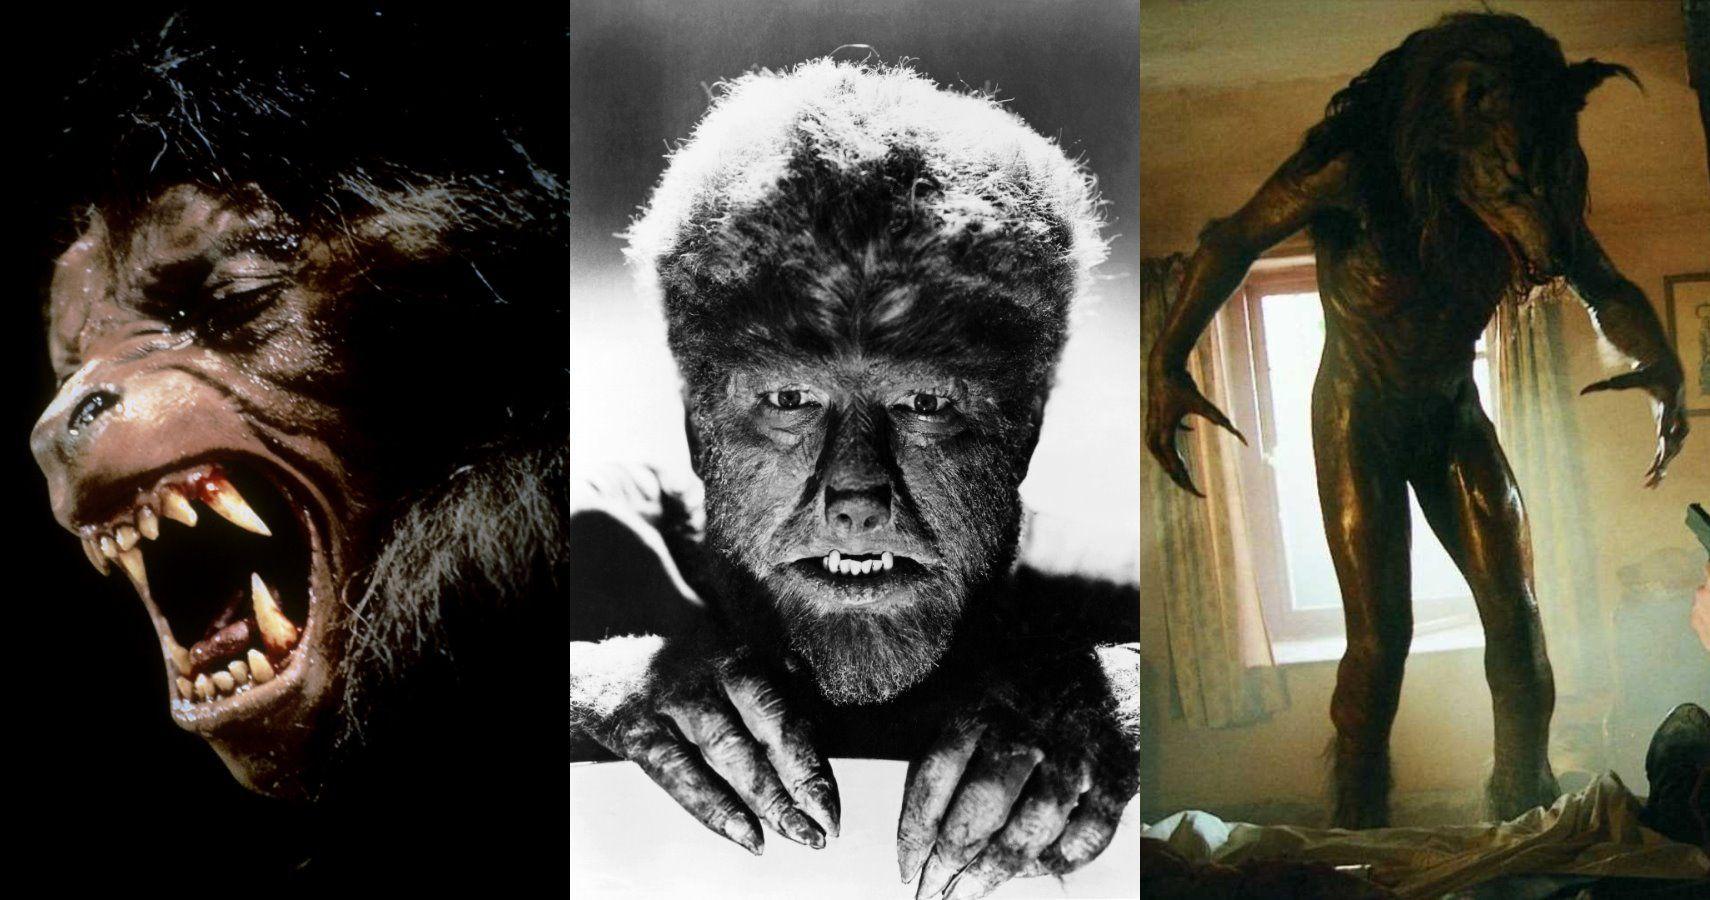 10 Best Werewolf Horror Movies According To Imdb Screenrant